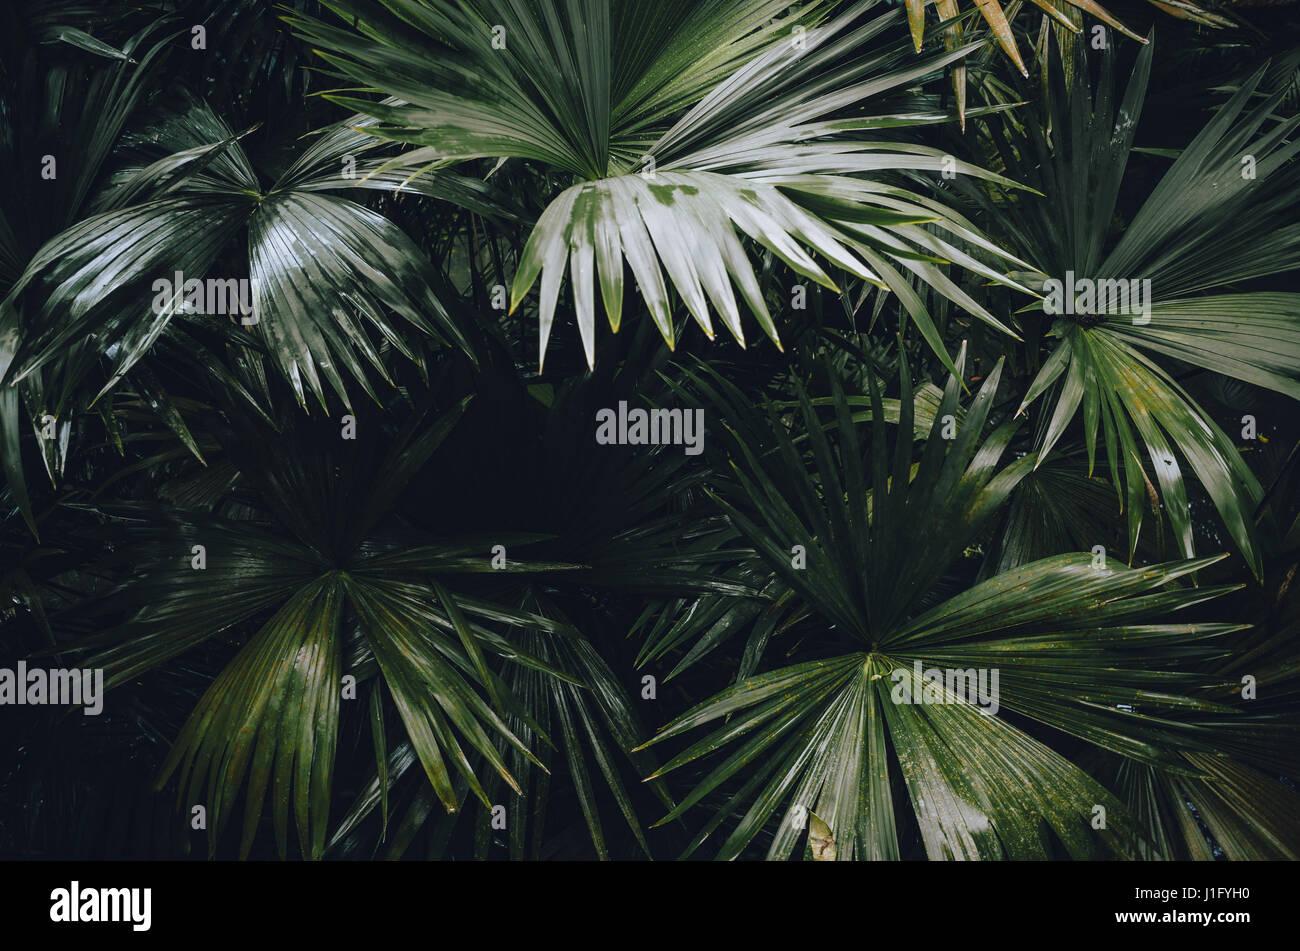 Plants in the amazon rainforest close to Belém, Pará, Brazil - Stock Image